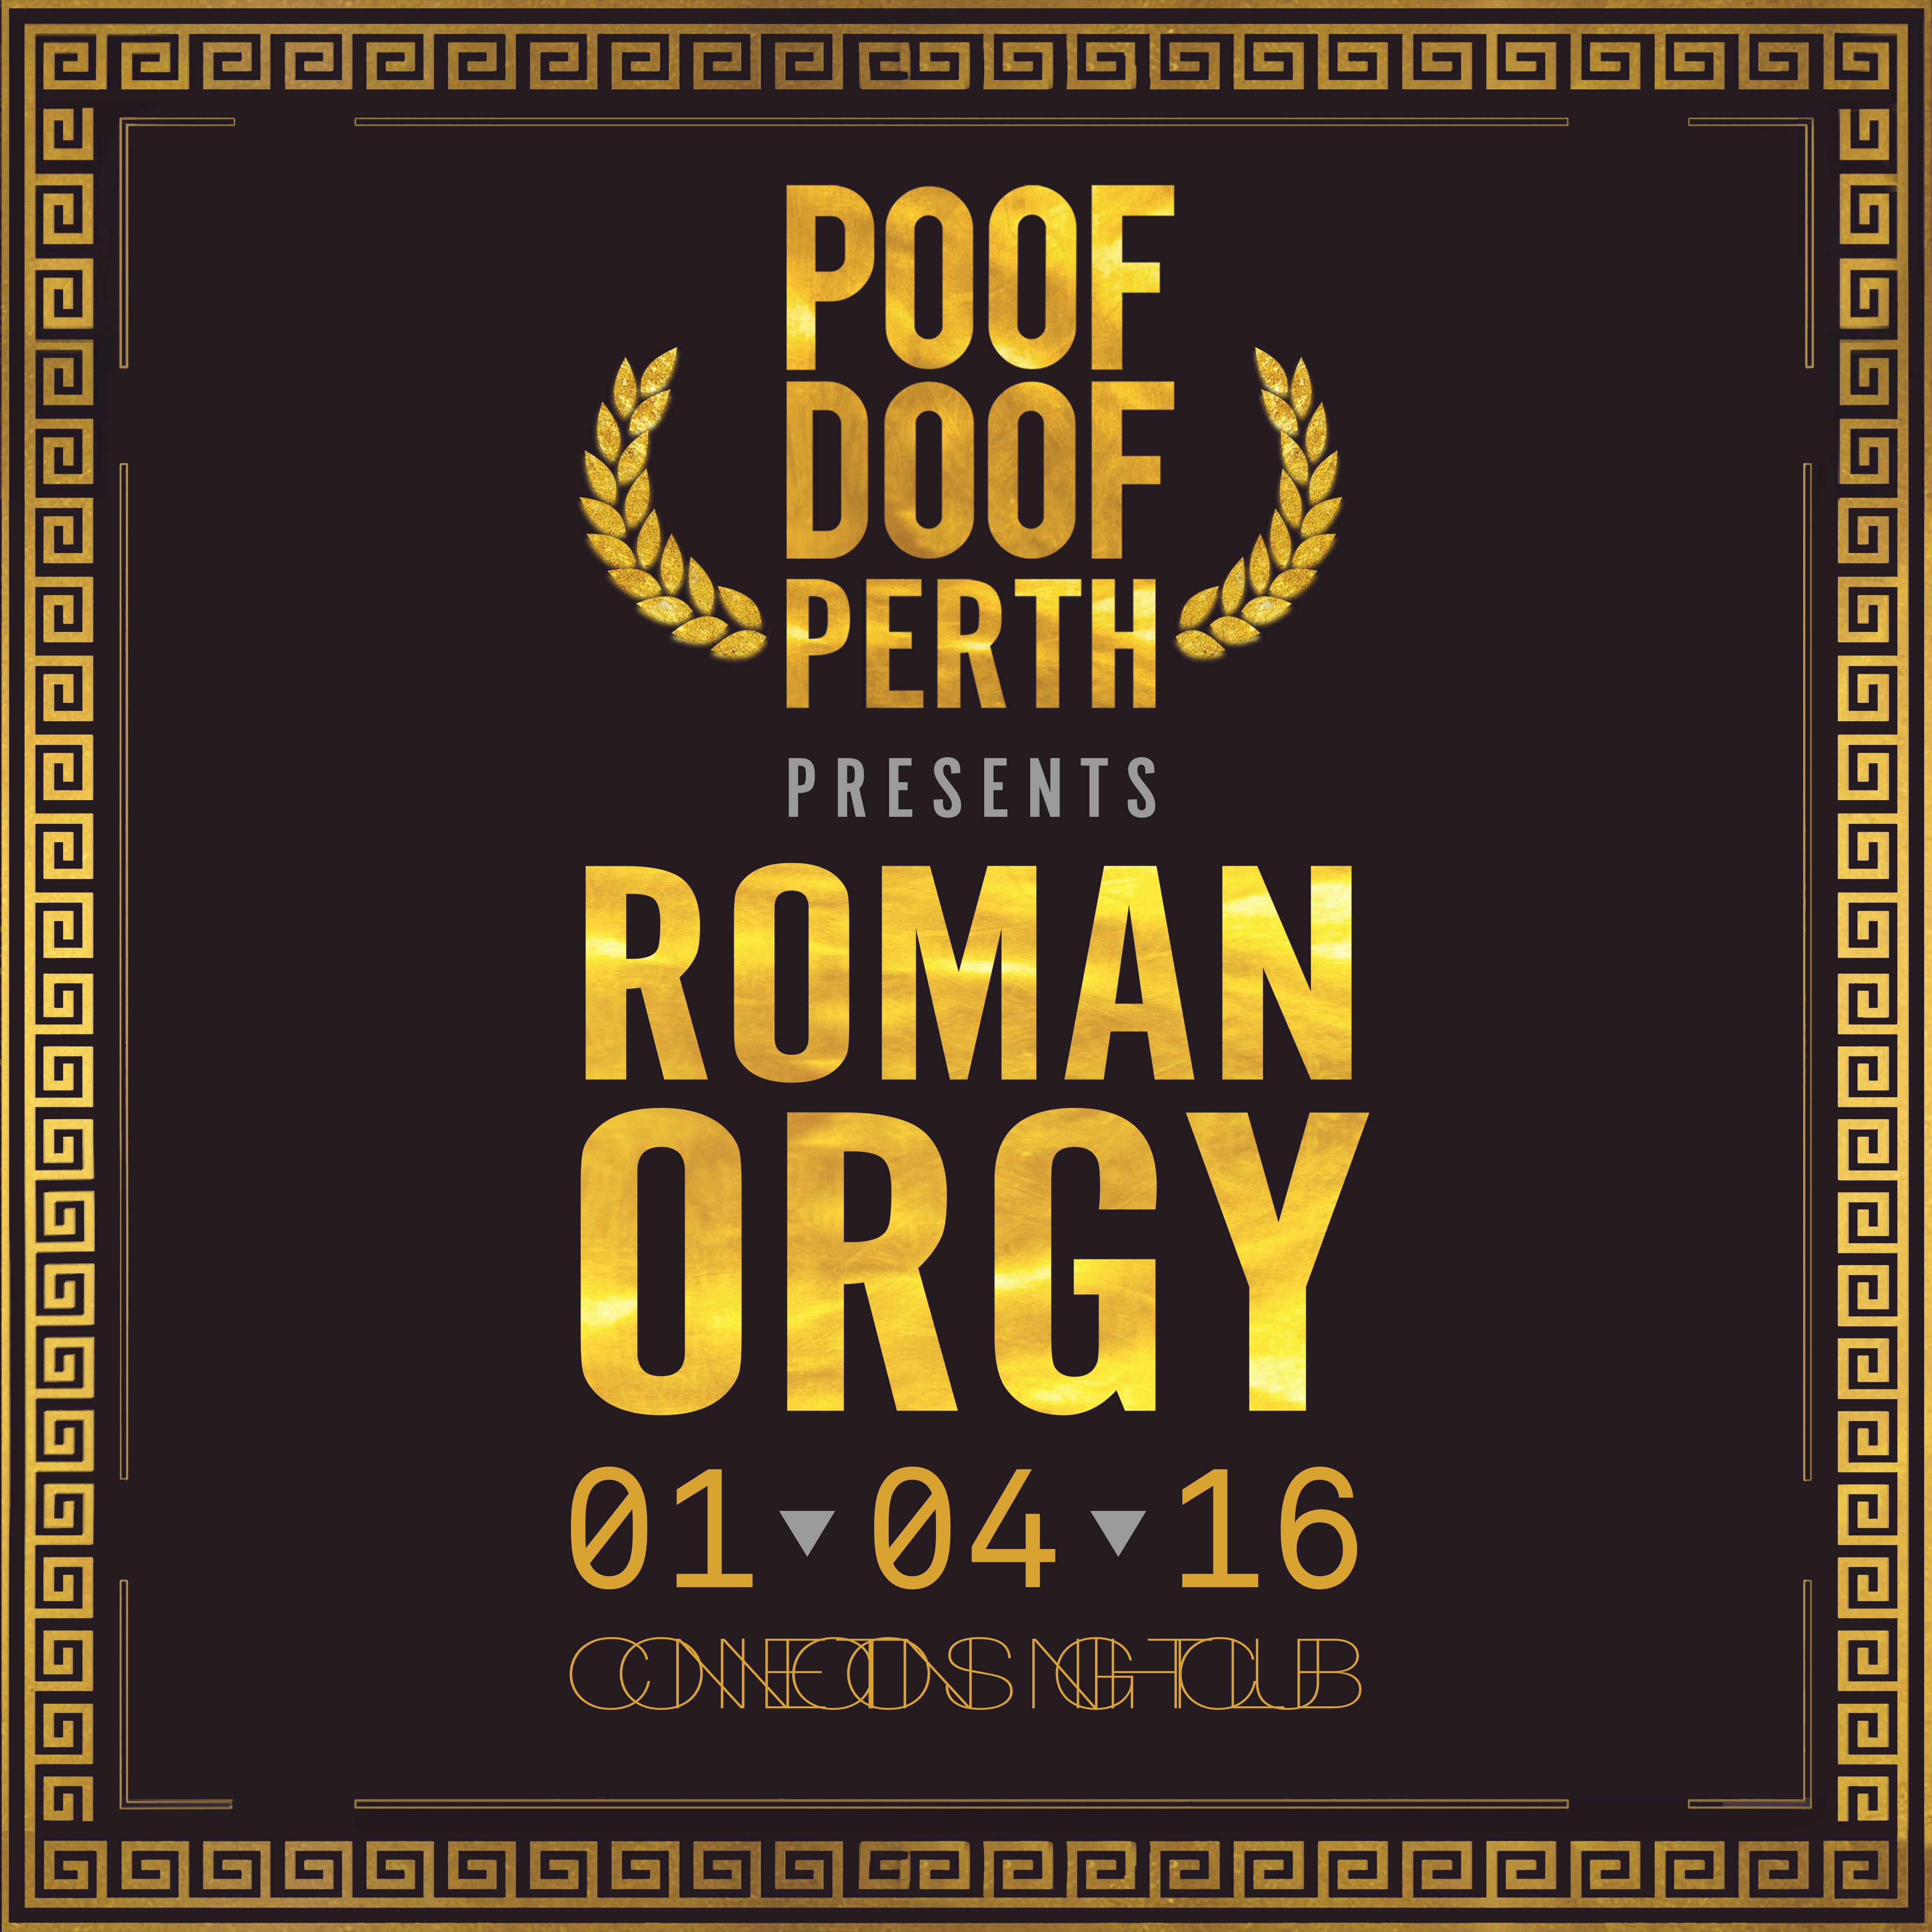 perth orgy Perth city councillors ticket orgy | Dullsville | Ben Lee | Roberta Flack.